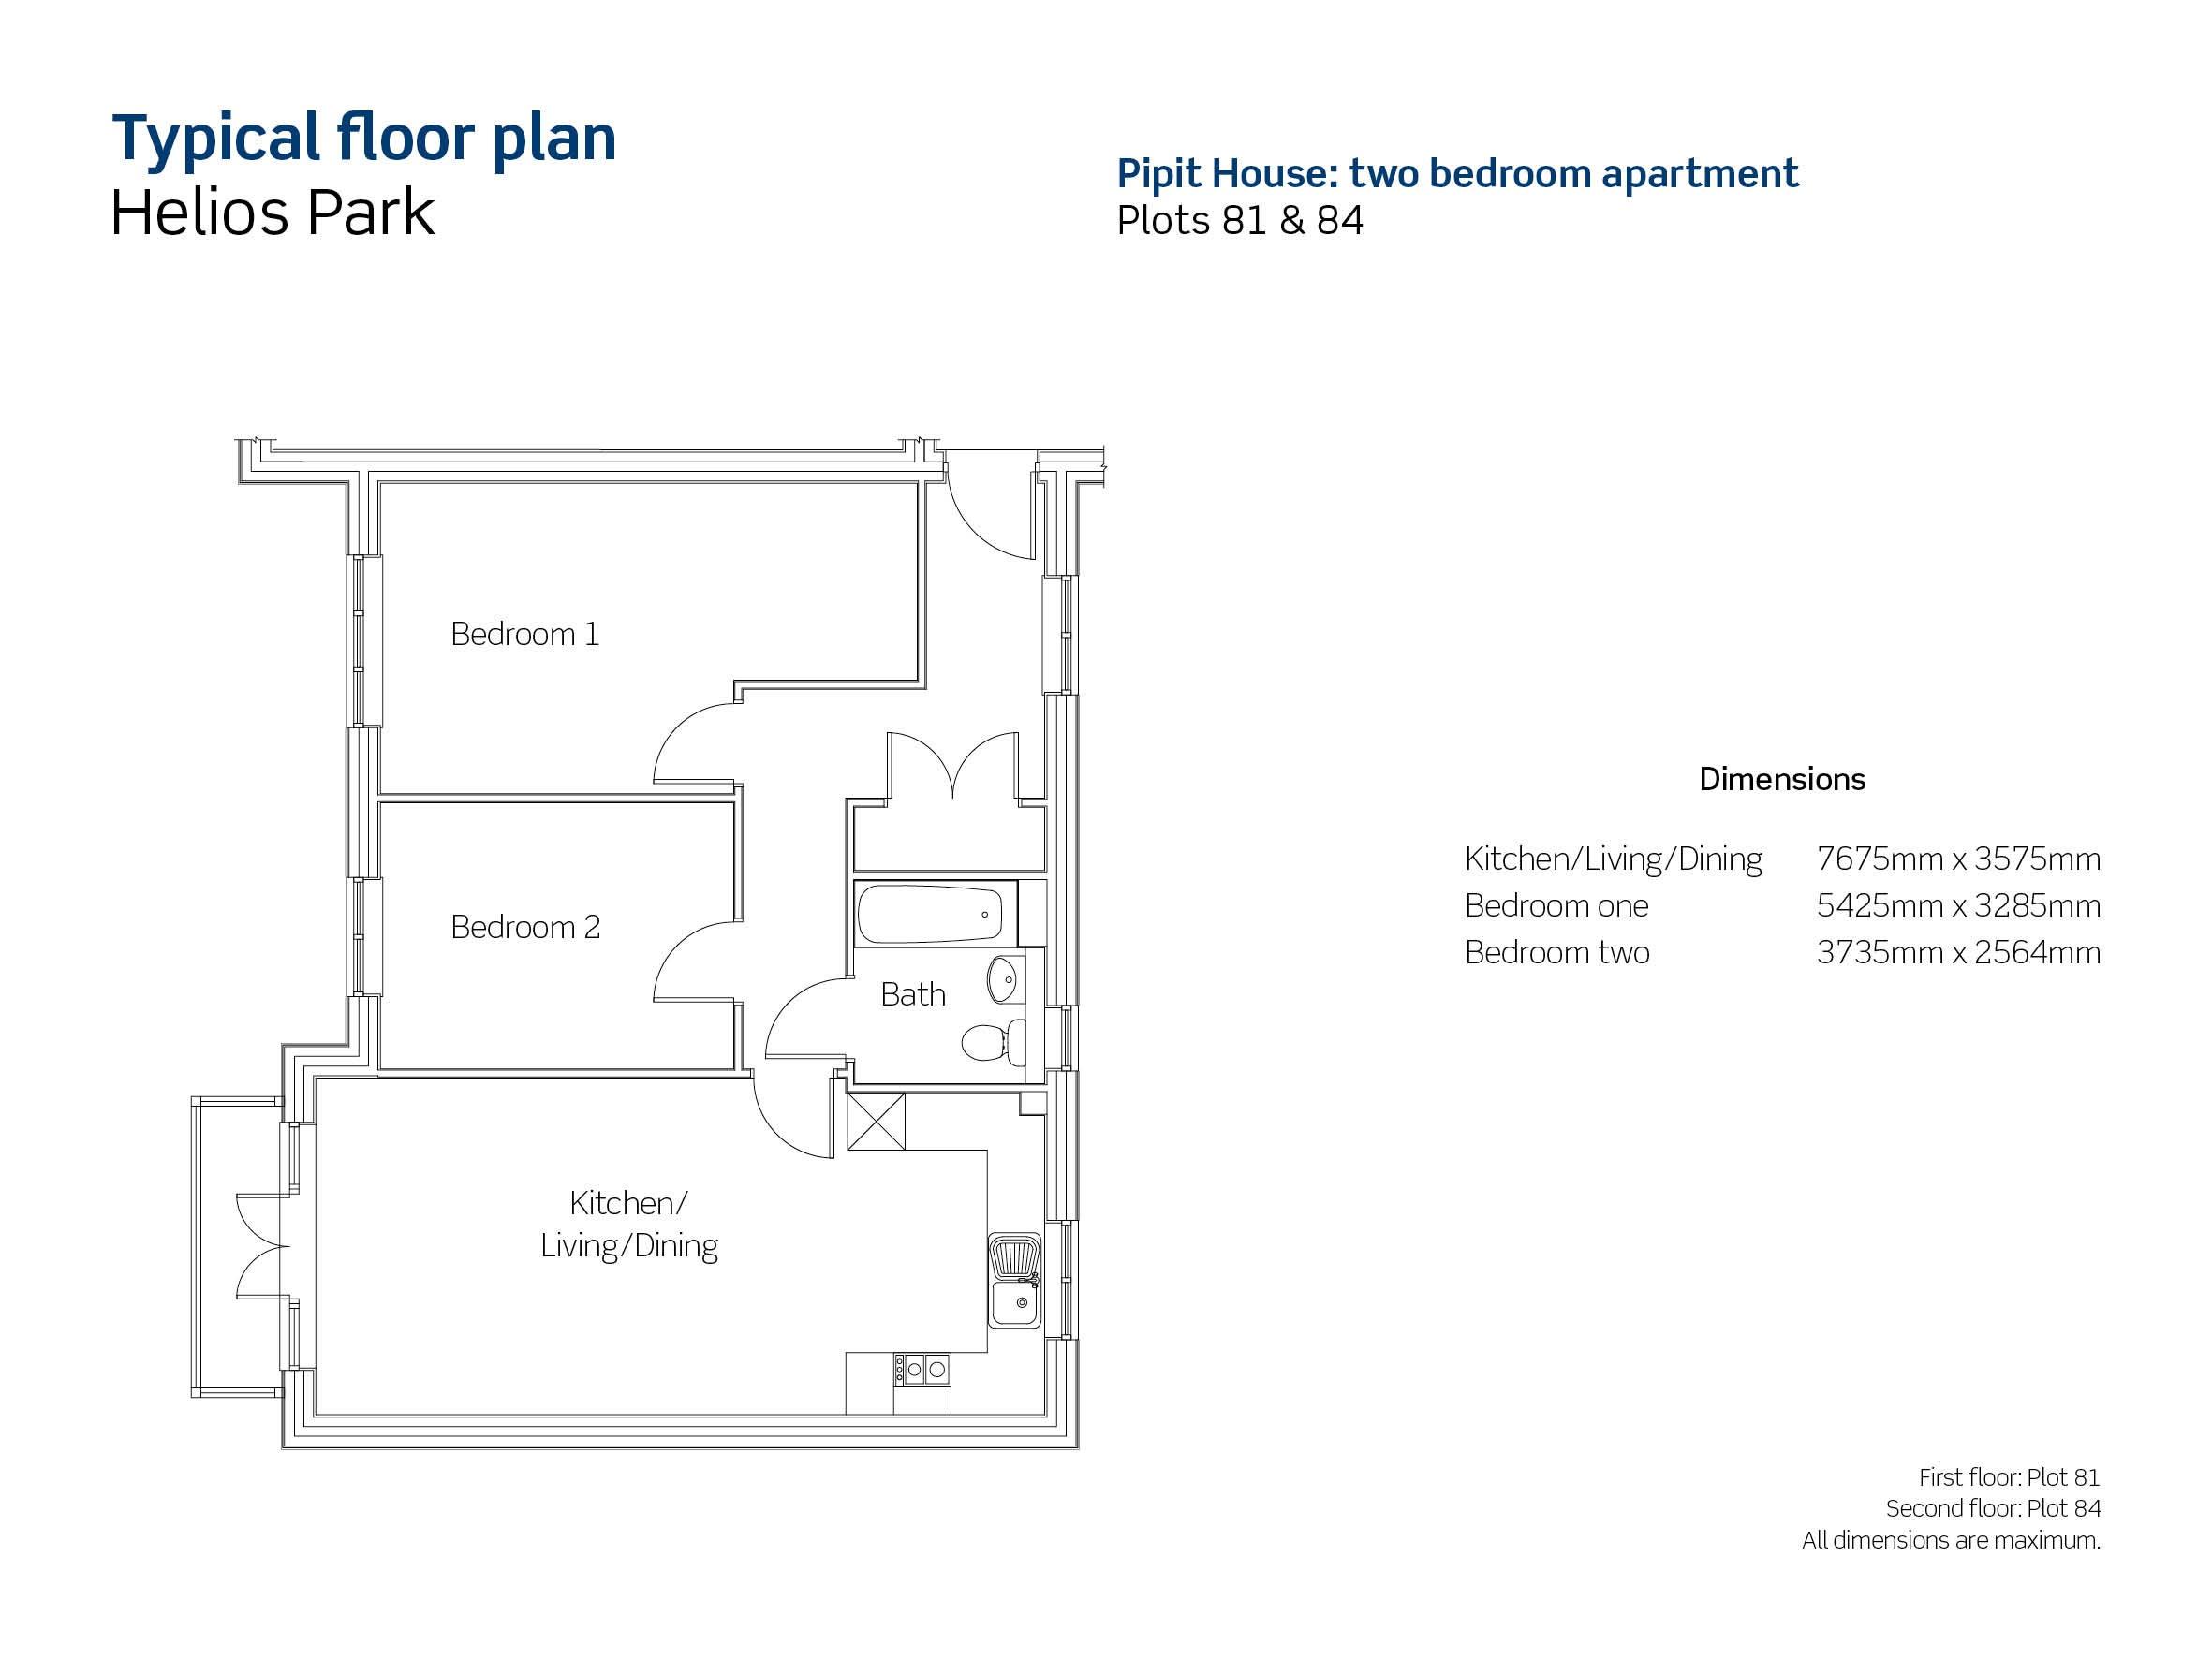 Helios Park plot 81 floor plan